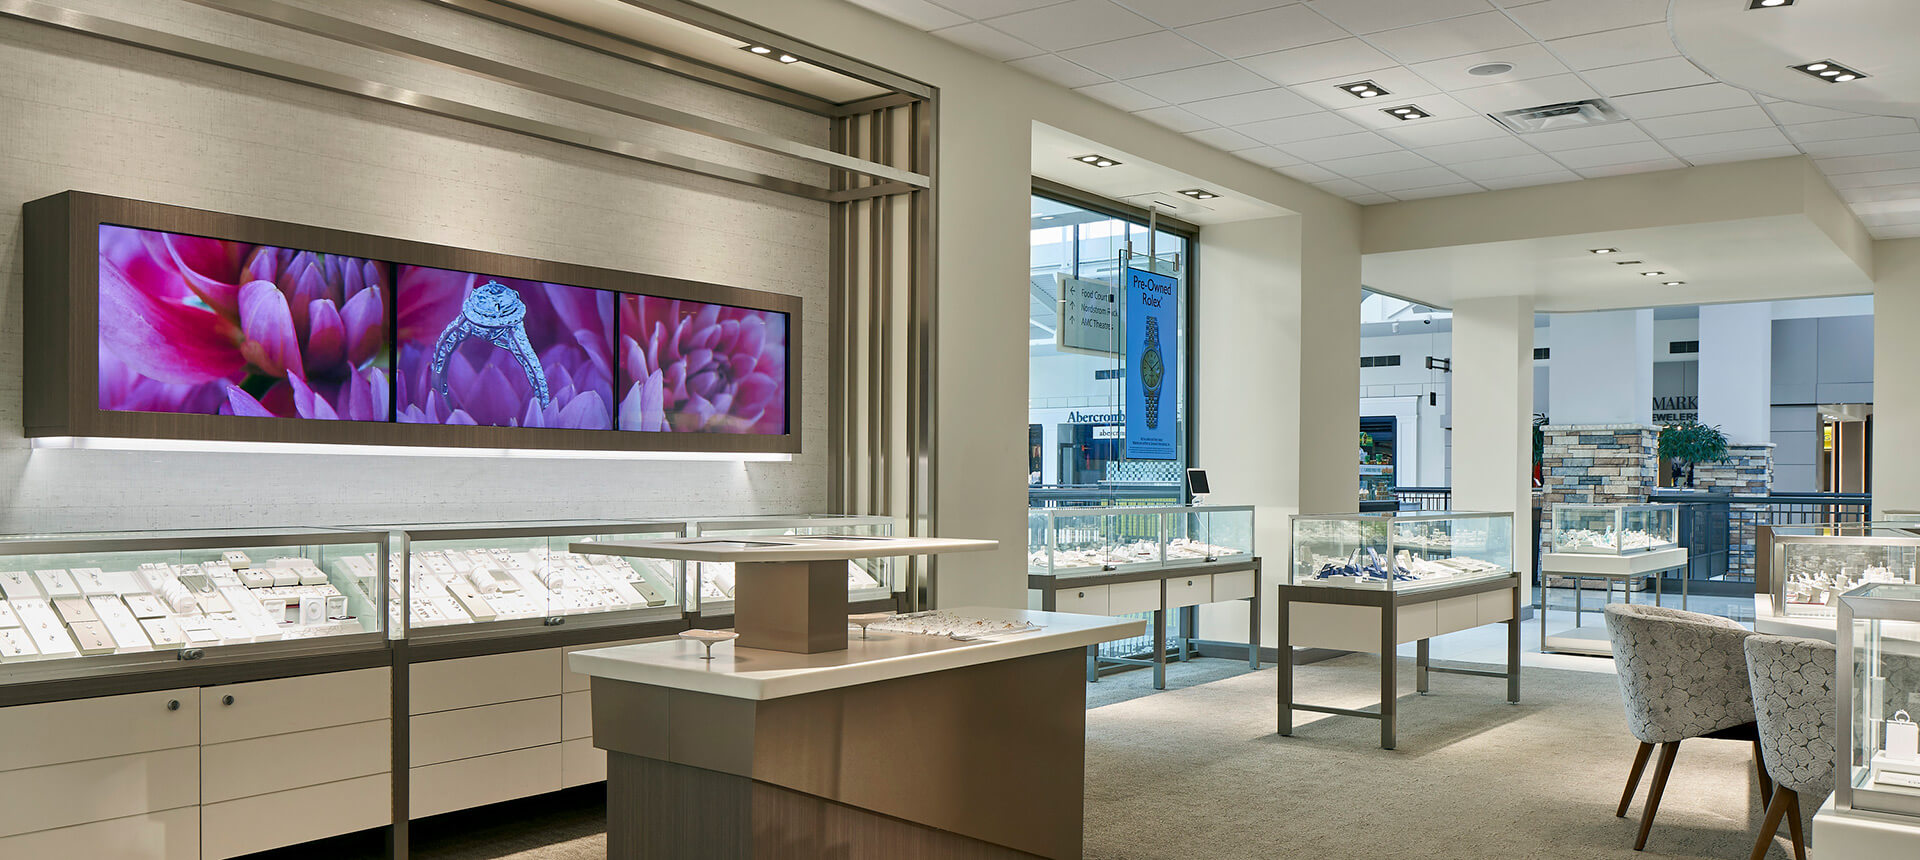 Helzberg Diamonds Store interior